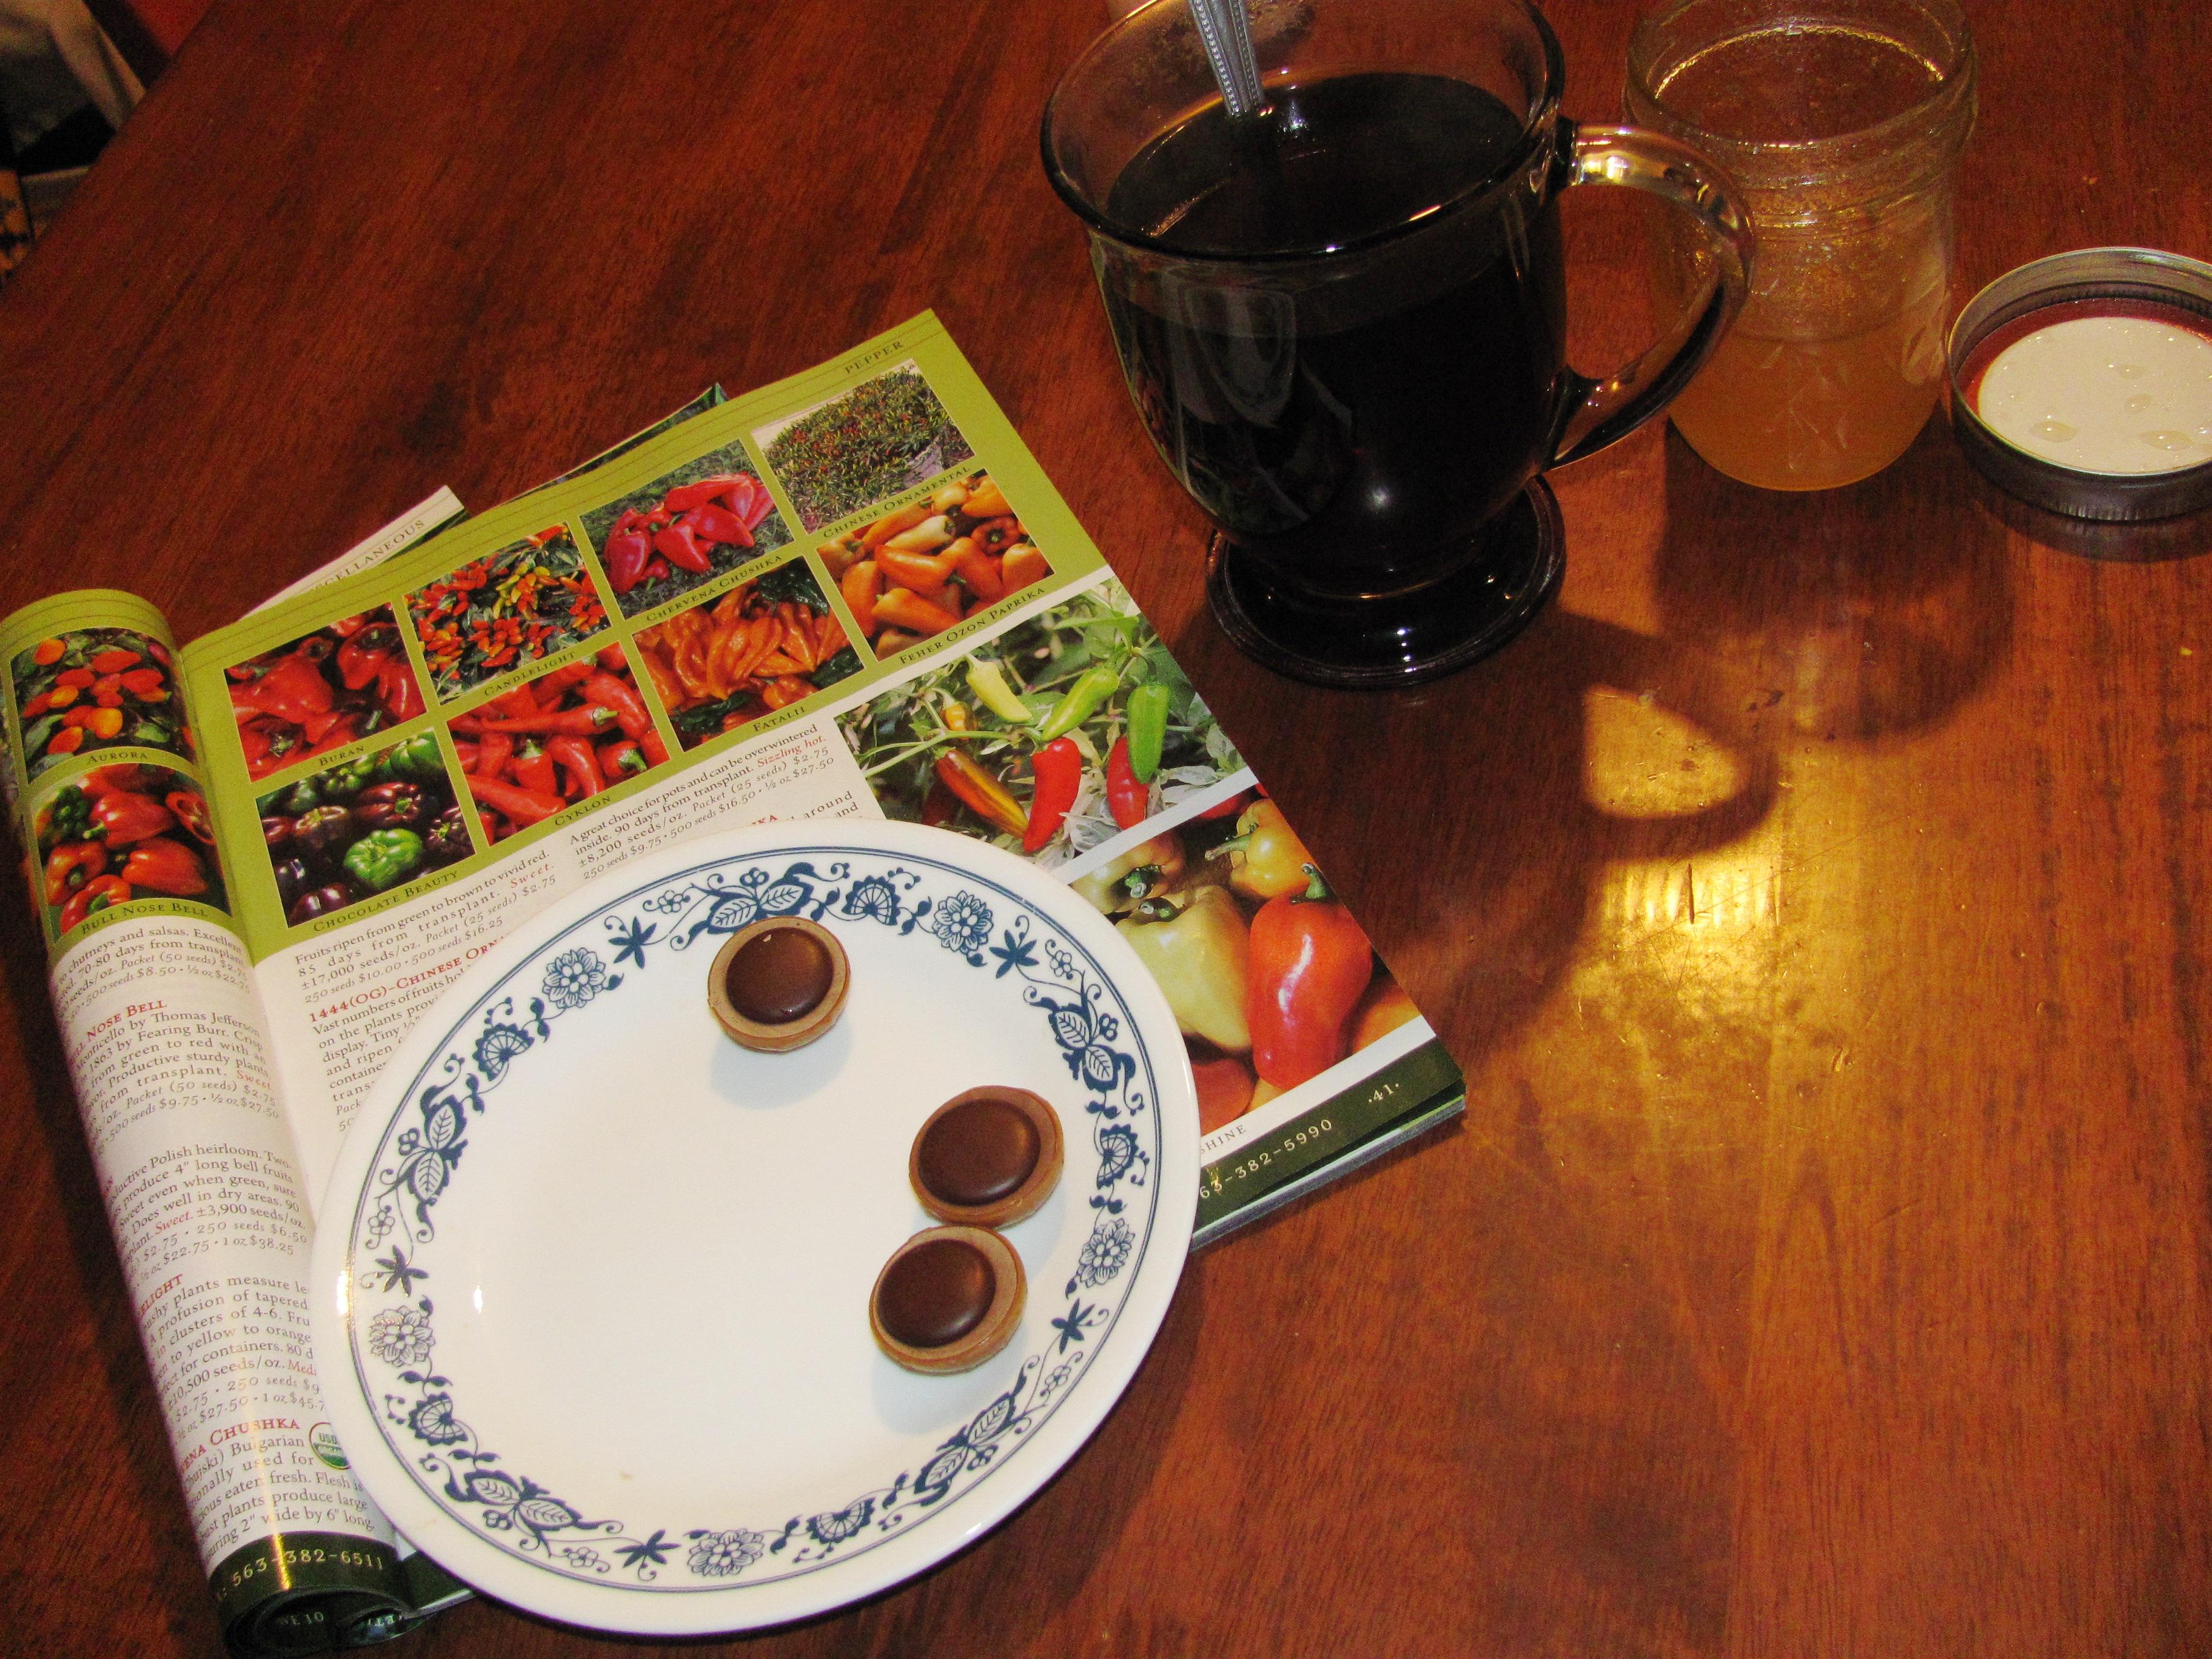 Tea, chocolate, and my catalog